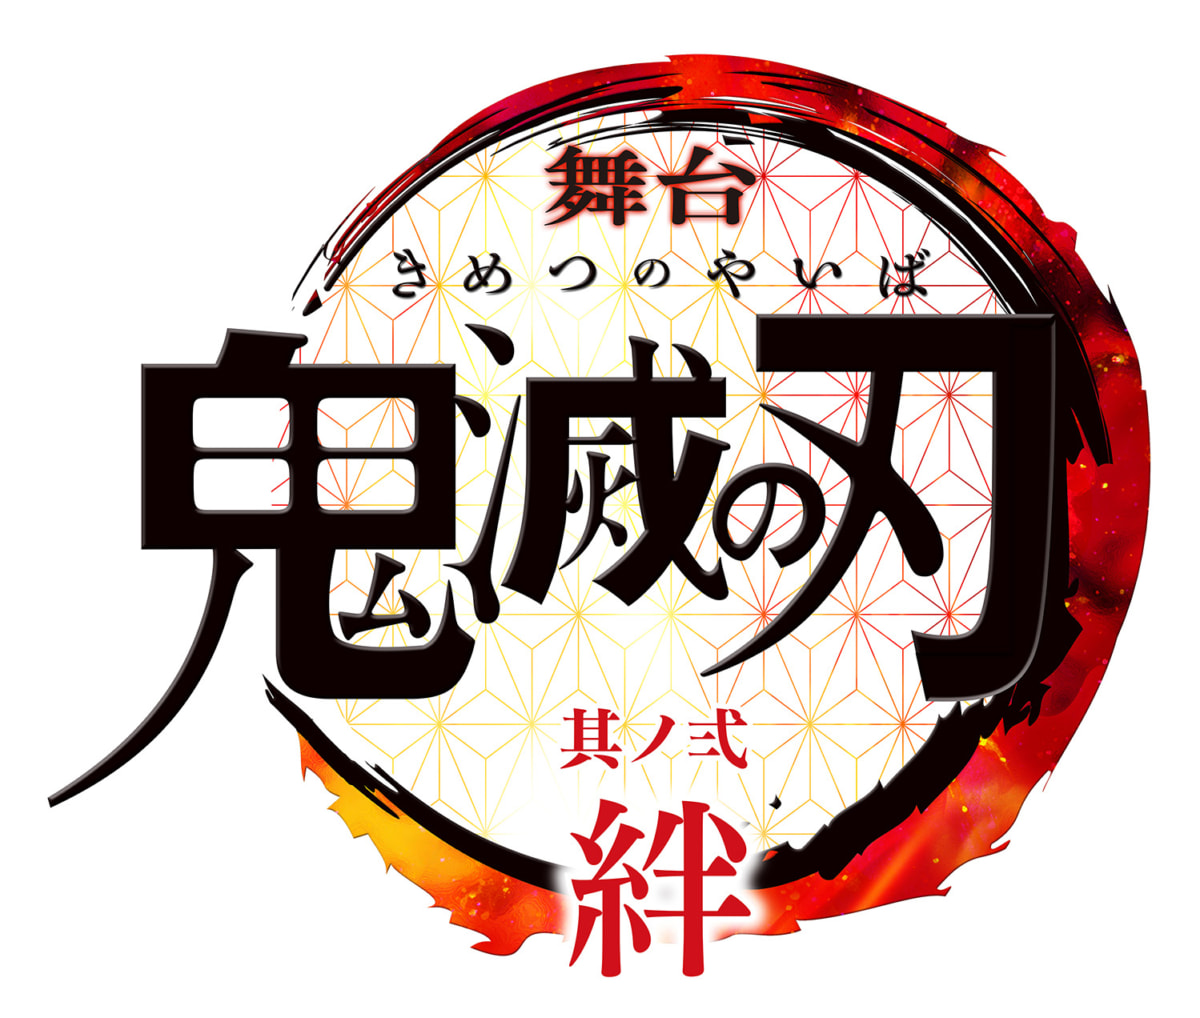 舞台「鬼滅の刃」其ノ弐 絆